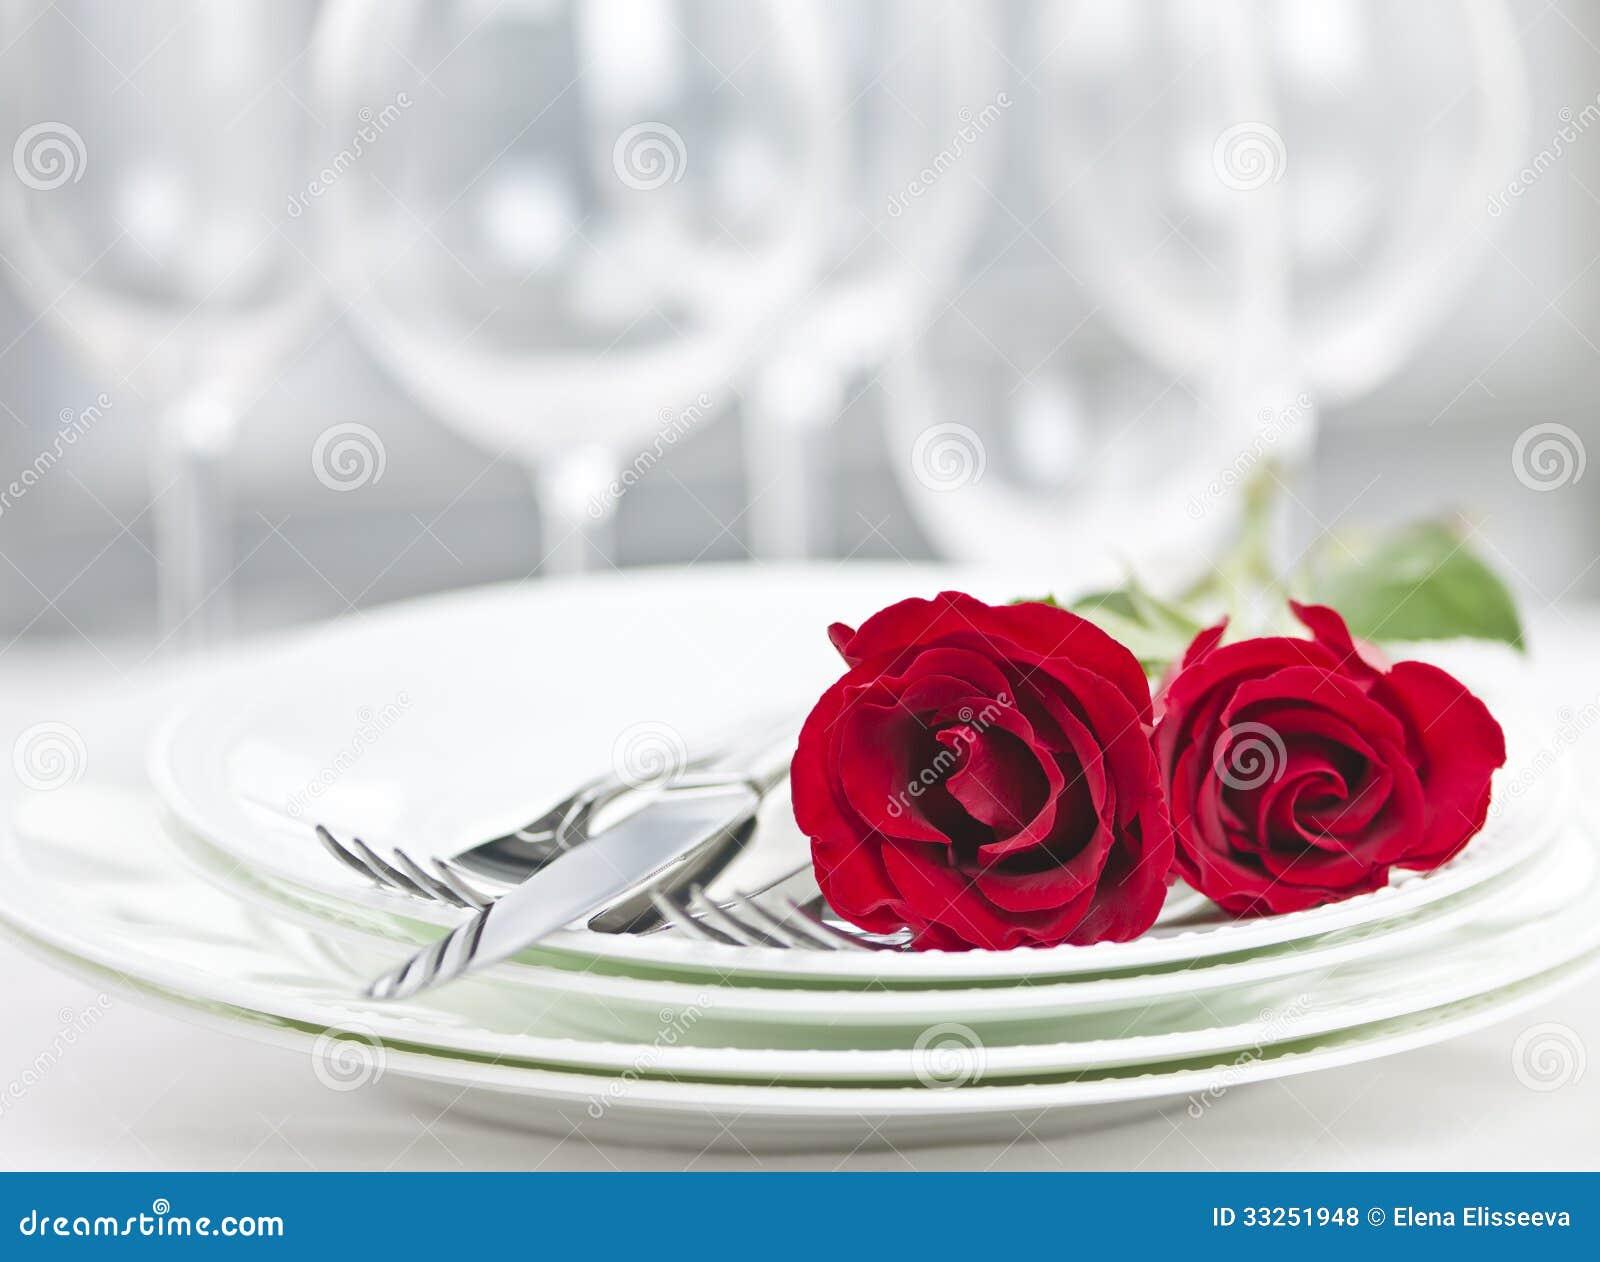 Romantic restaurant dinner setting stock photo image for Table for two